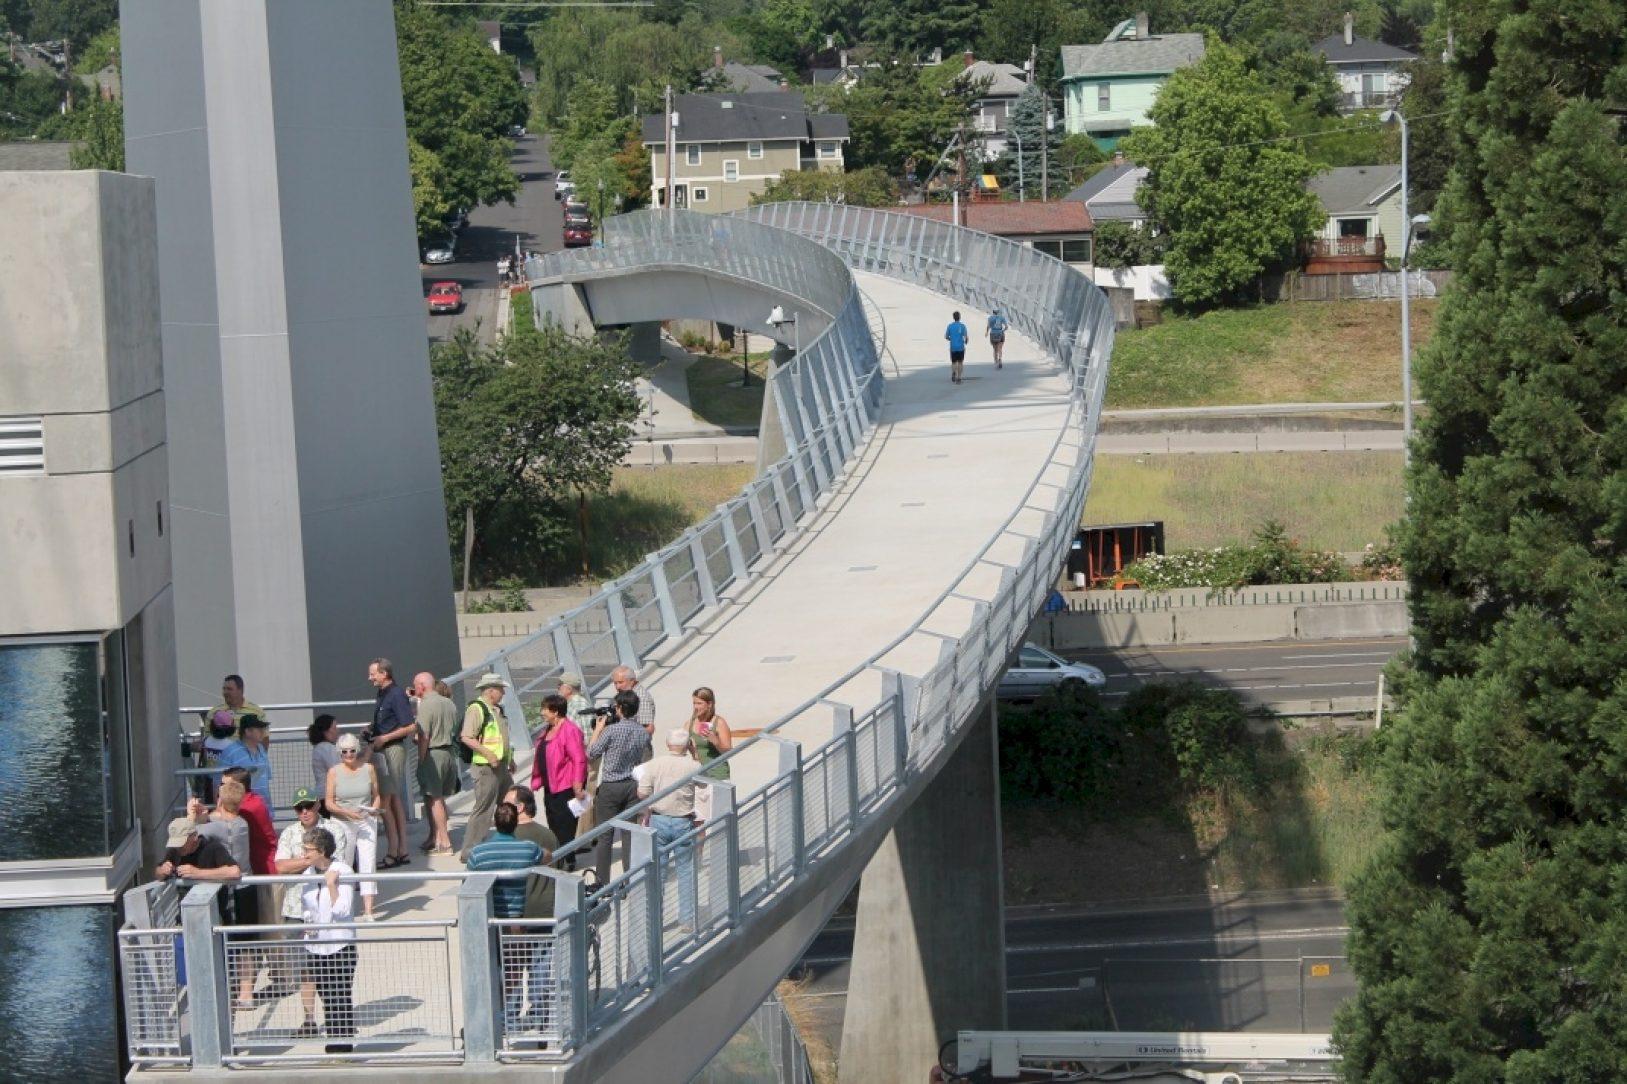 Lair Pedestrian Bridge Hill Portland Girder